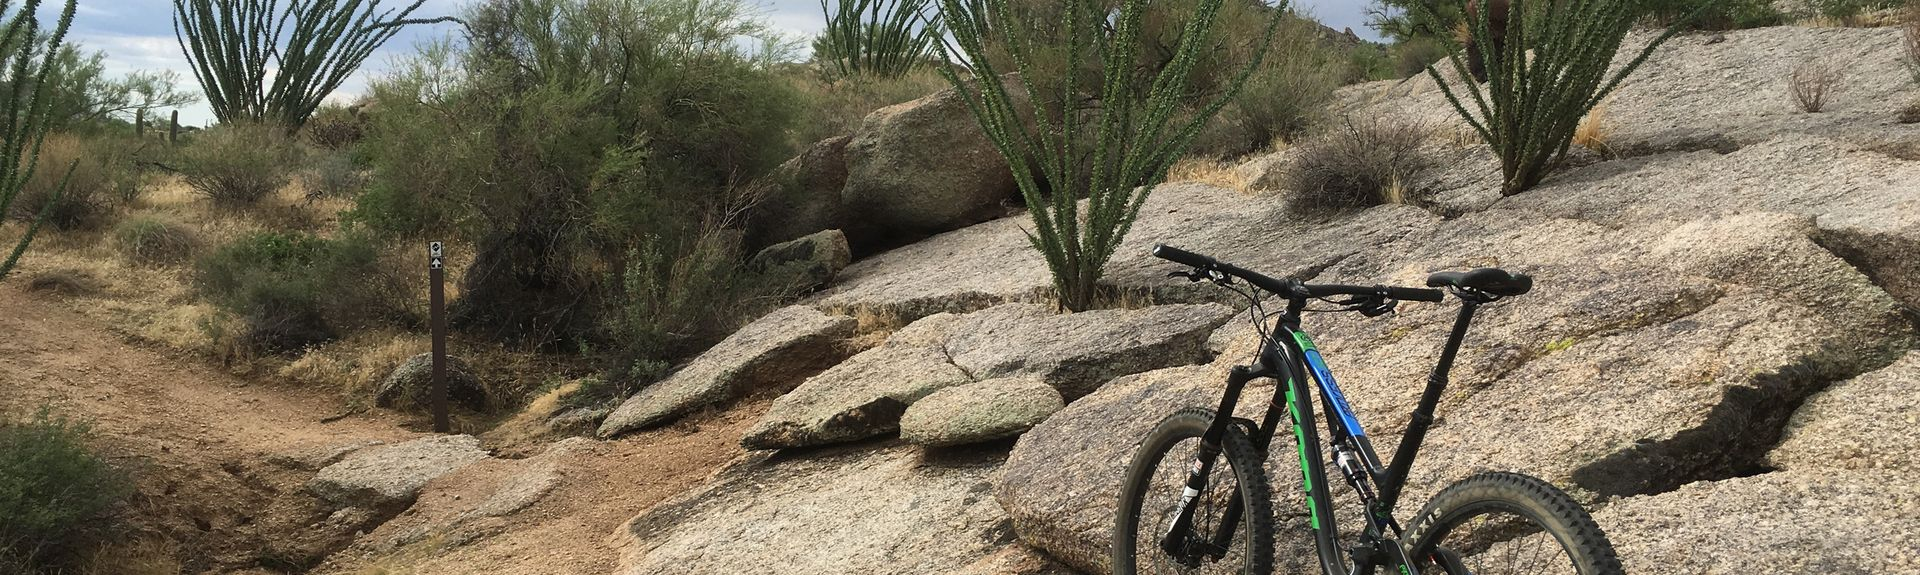 Rio Verde Foothills, Scottsdale, Arizona, Estados Unidos